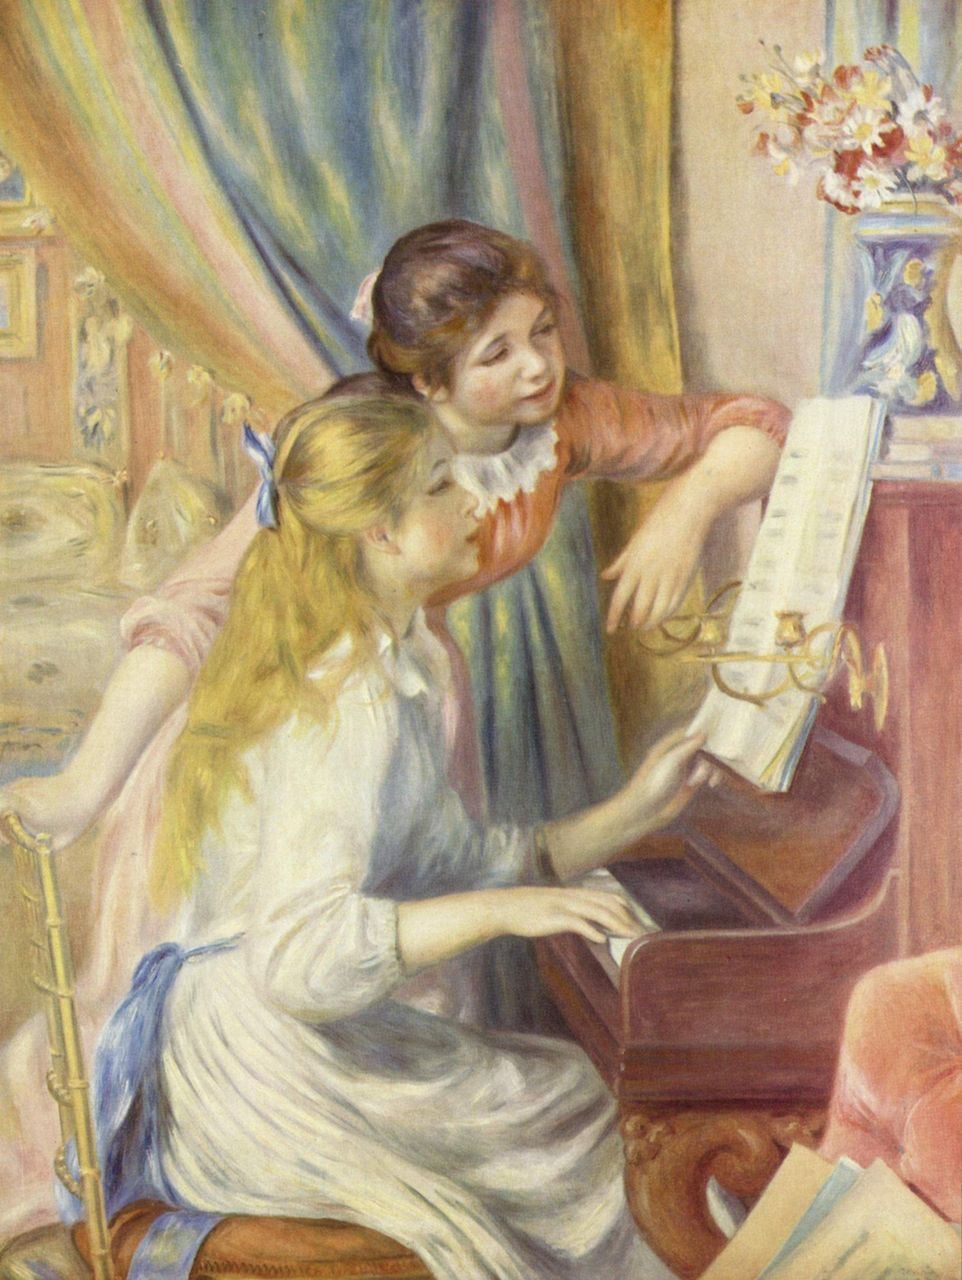 Chopin, Frédéric: Nocturne Opus 9 No. 2